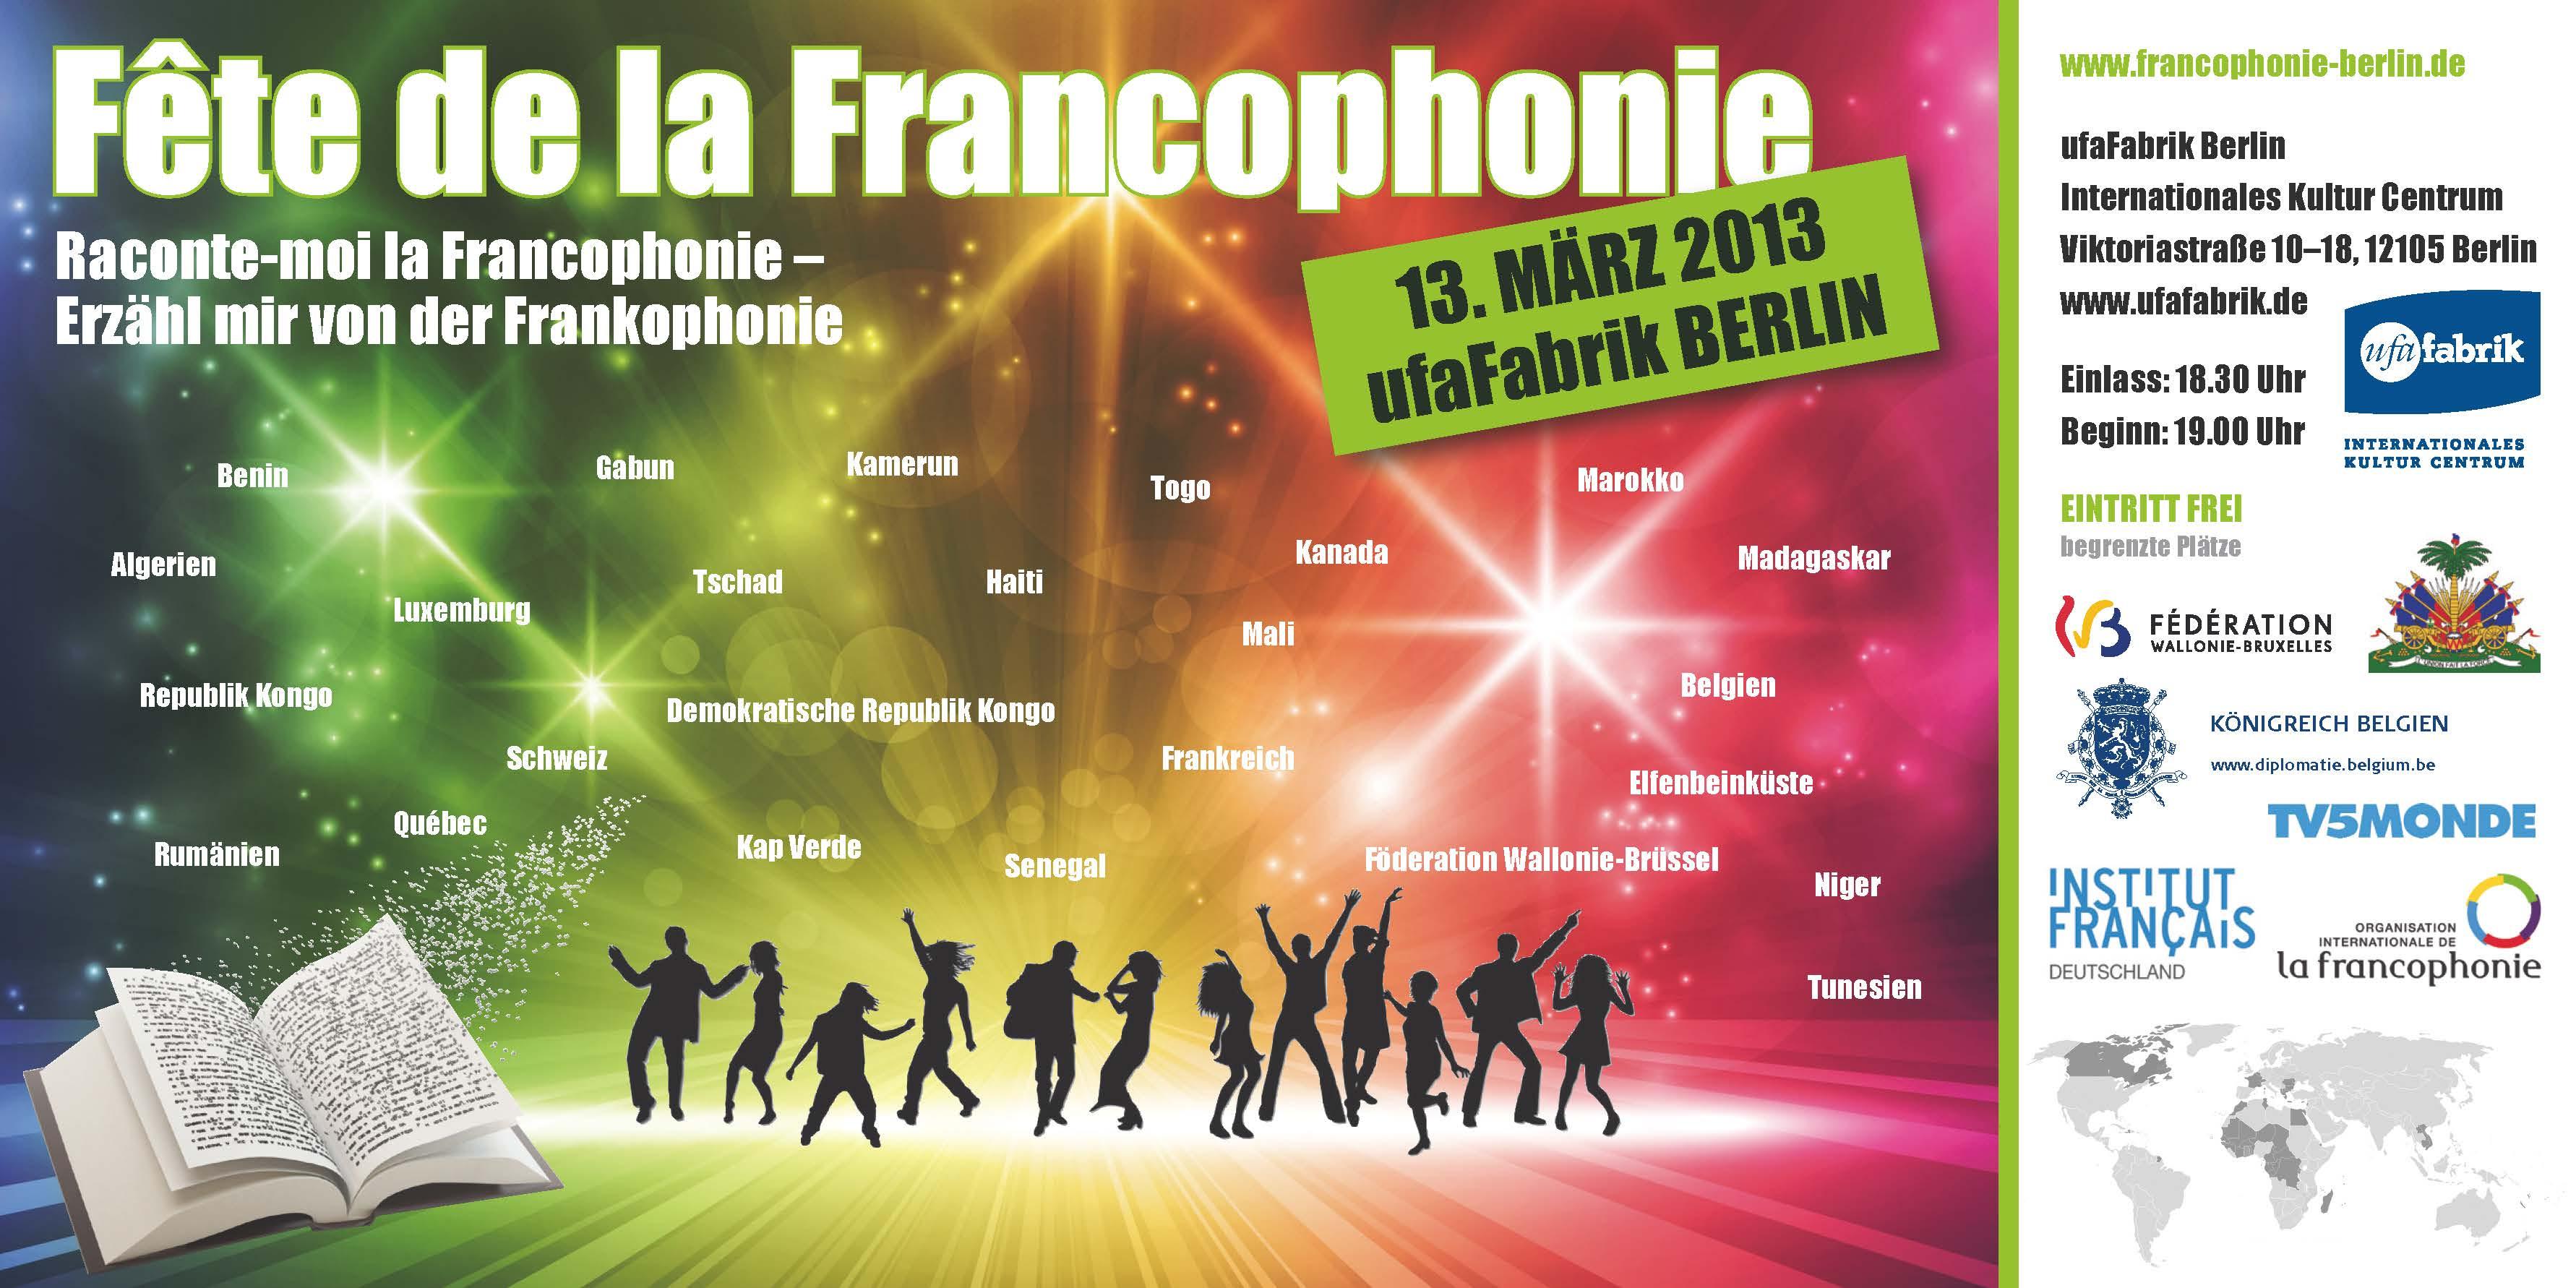 http://www2.mae.lu/var/fr/storage/images/media/images/fete-de-la-francophonie_2013_final-2-_page_1/273653-1-fre-FR/Fete-de-la-francophonie_2013_FINAL-2-_Page_1.jpg